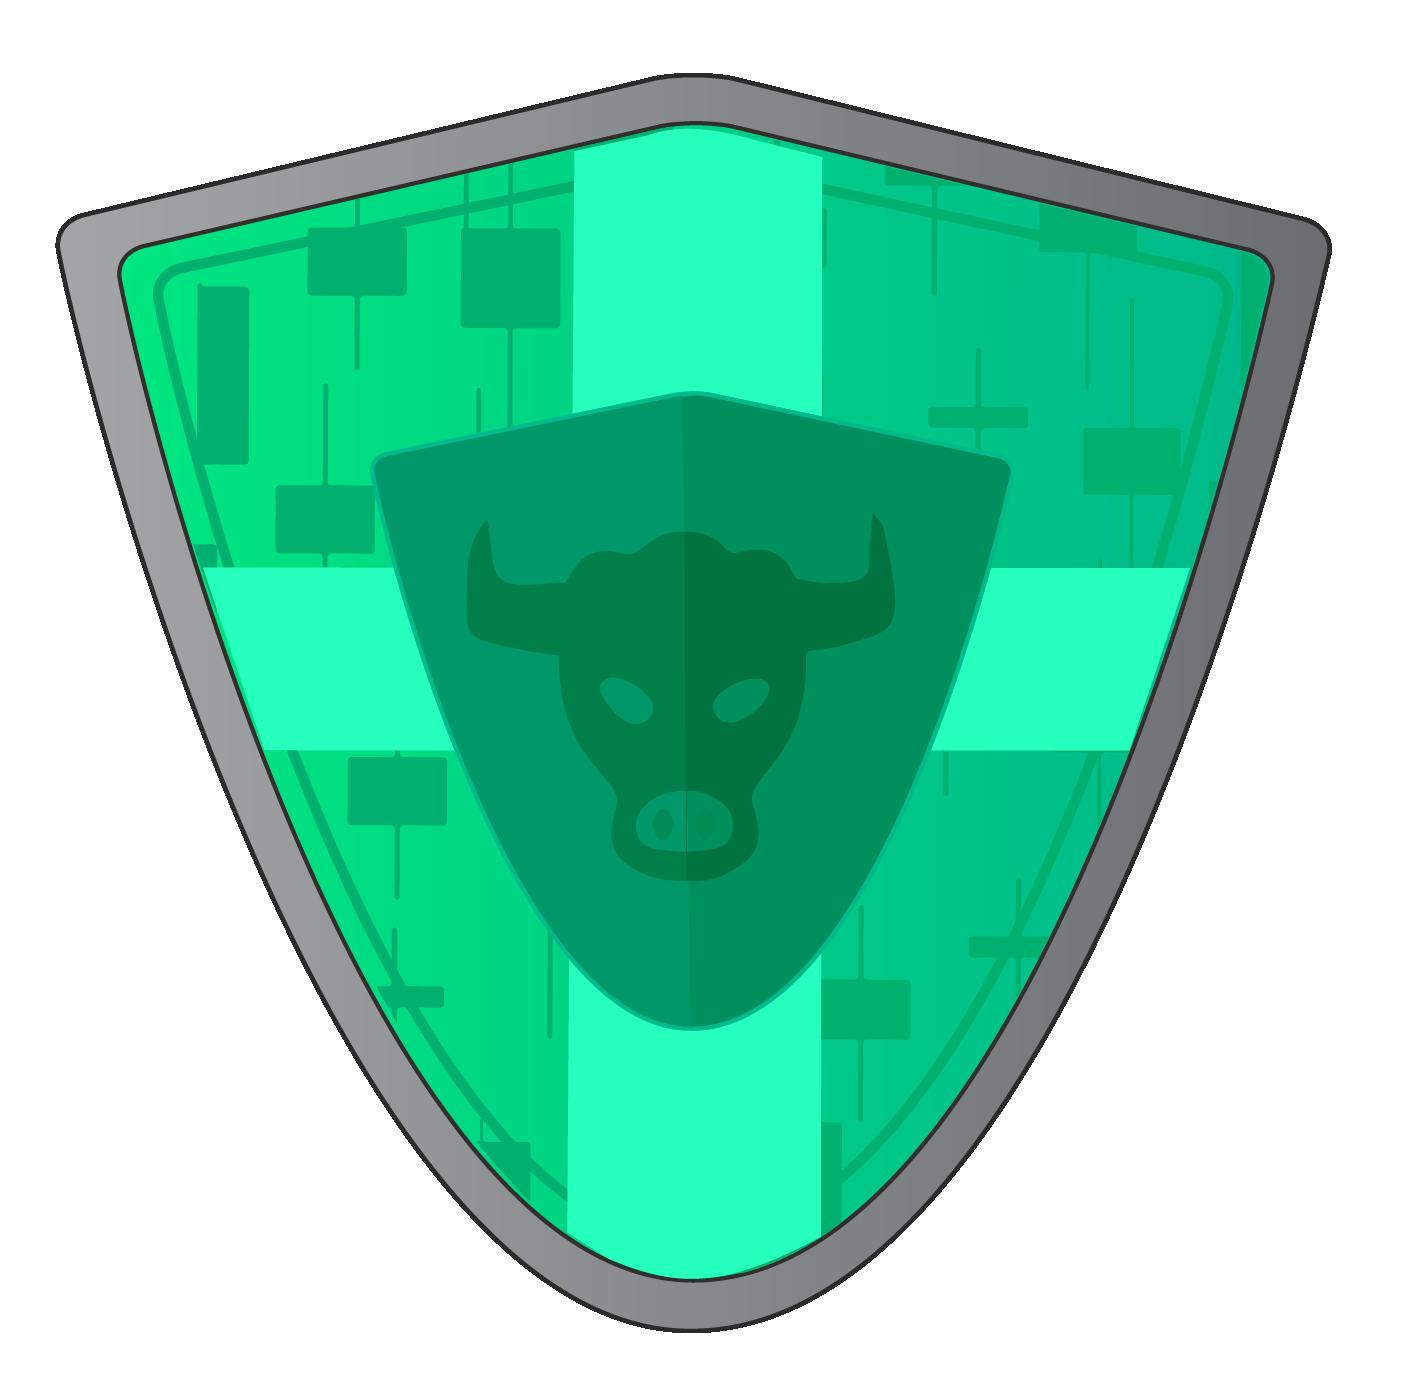 Lamorak Product Launch - Shield